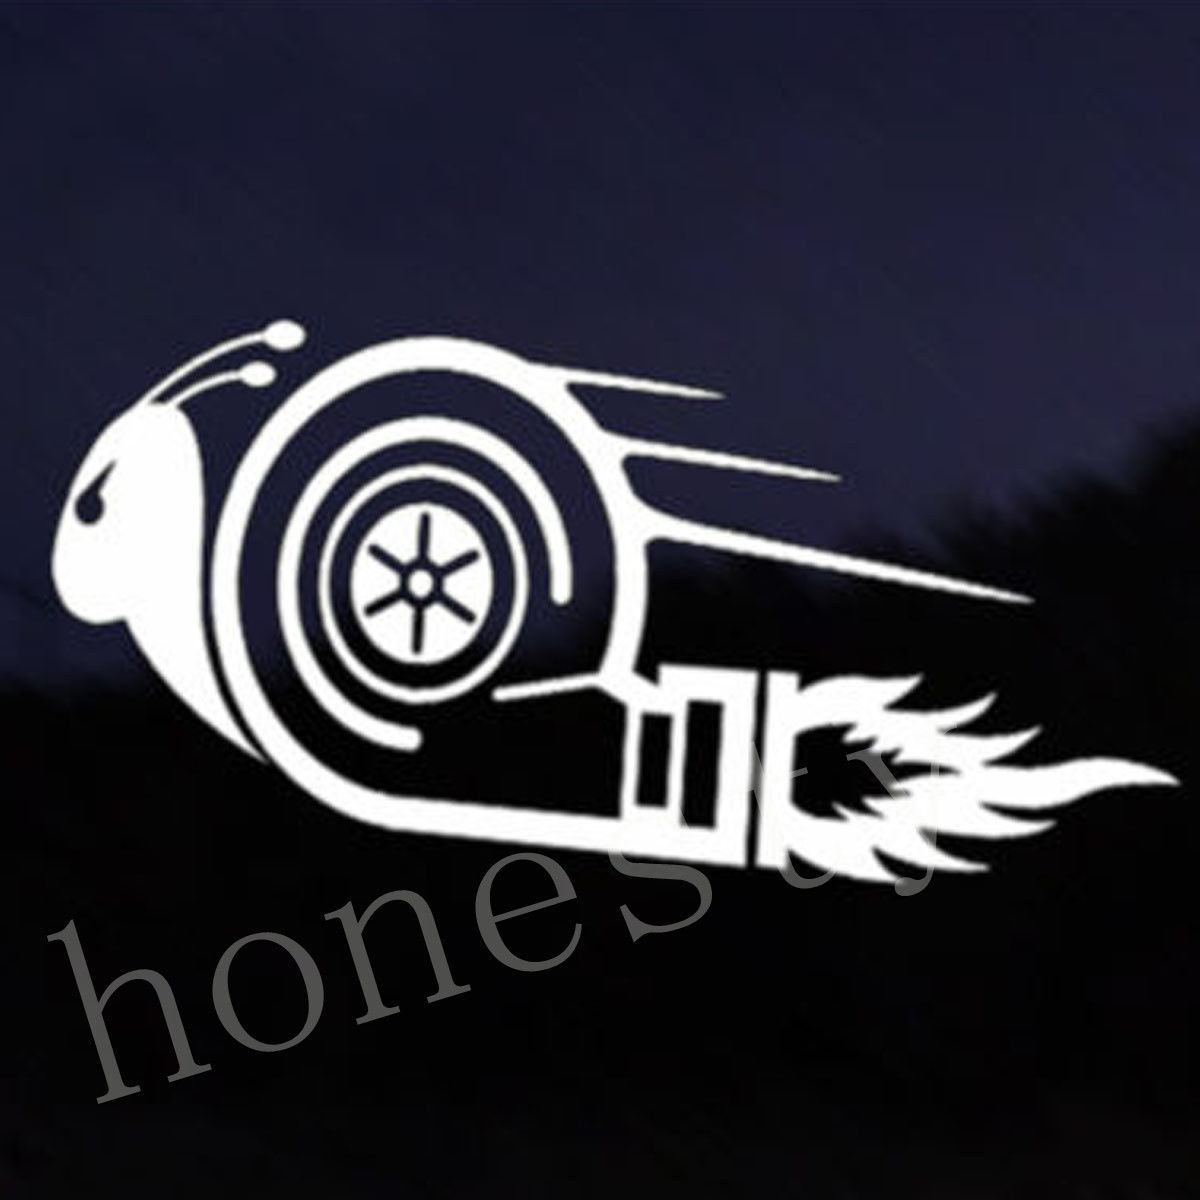 Race car sticker design - Funny Snail Car Decal Vinyl Sticker Jdm Vw Dub Drift Race Euro Swag Impreza Decals White